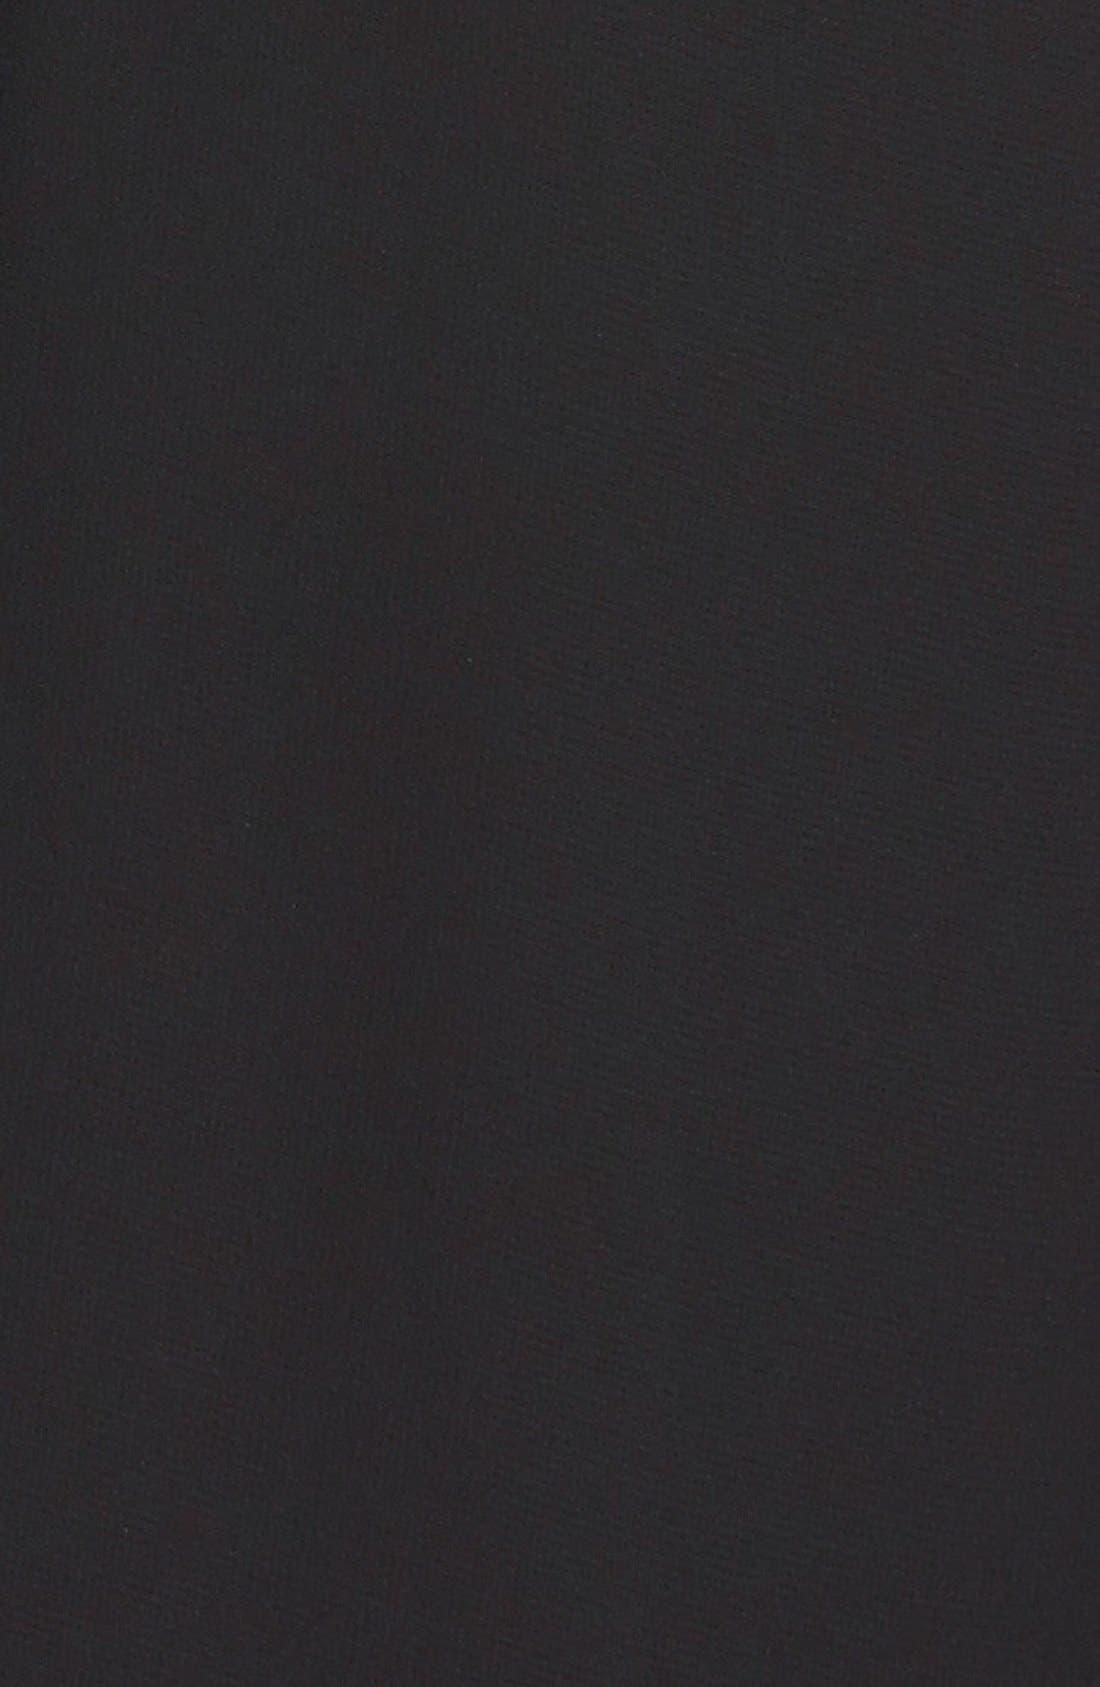 Blouson Chiffon Skater Dress,                             Alternate thumbnail 12, color,                             001